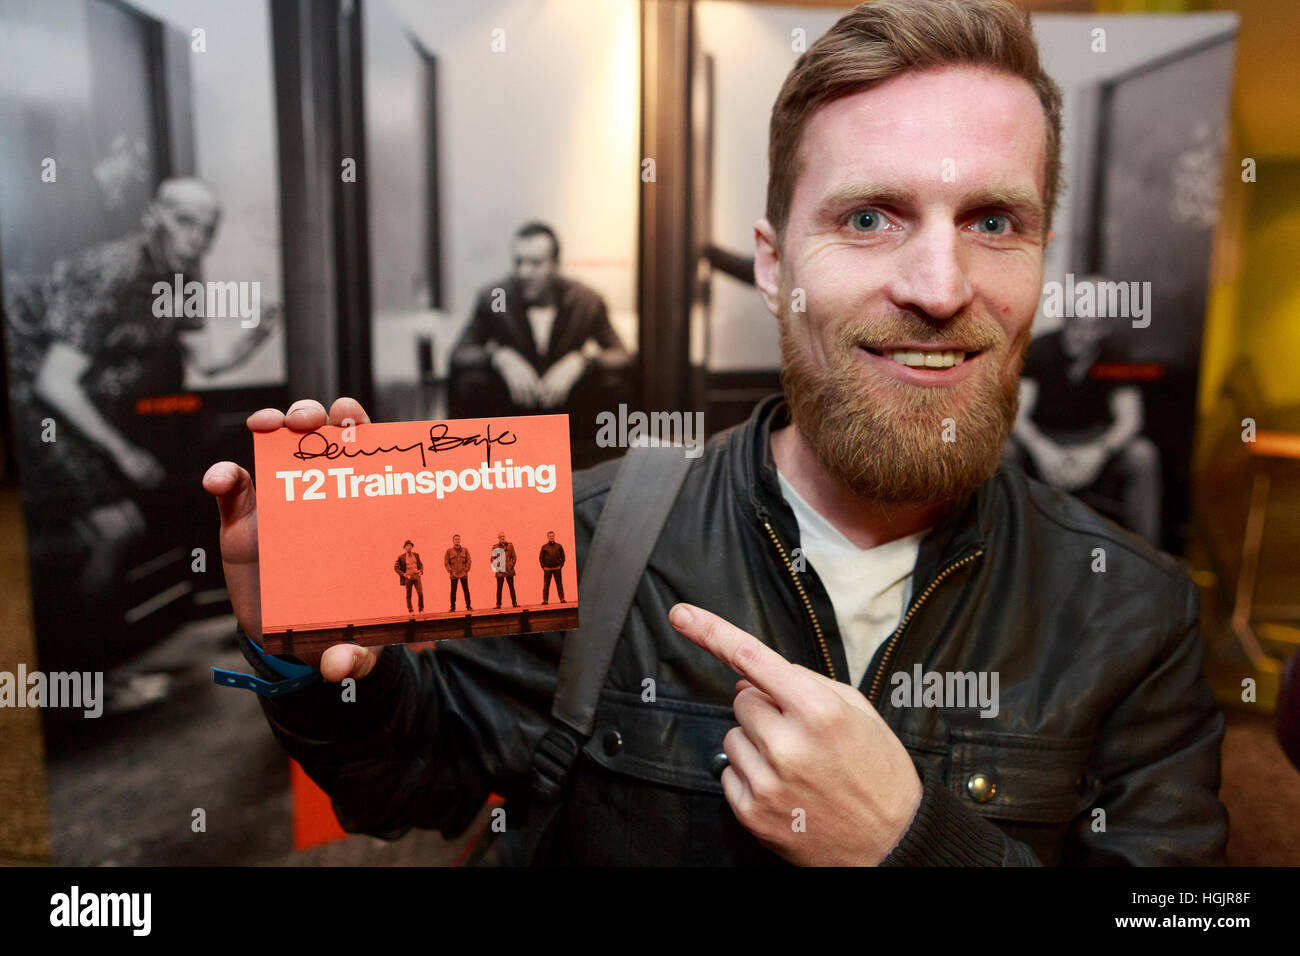 Edinburgh, UK. 22. Januar 2017. T2 Trainspotting Premiere beim Edinburgh Cineworld. Schottland. Abgebildete Kenny Stockbild